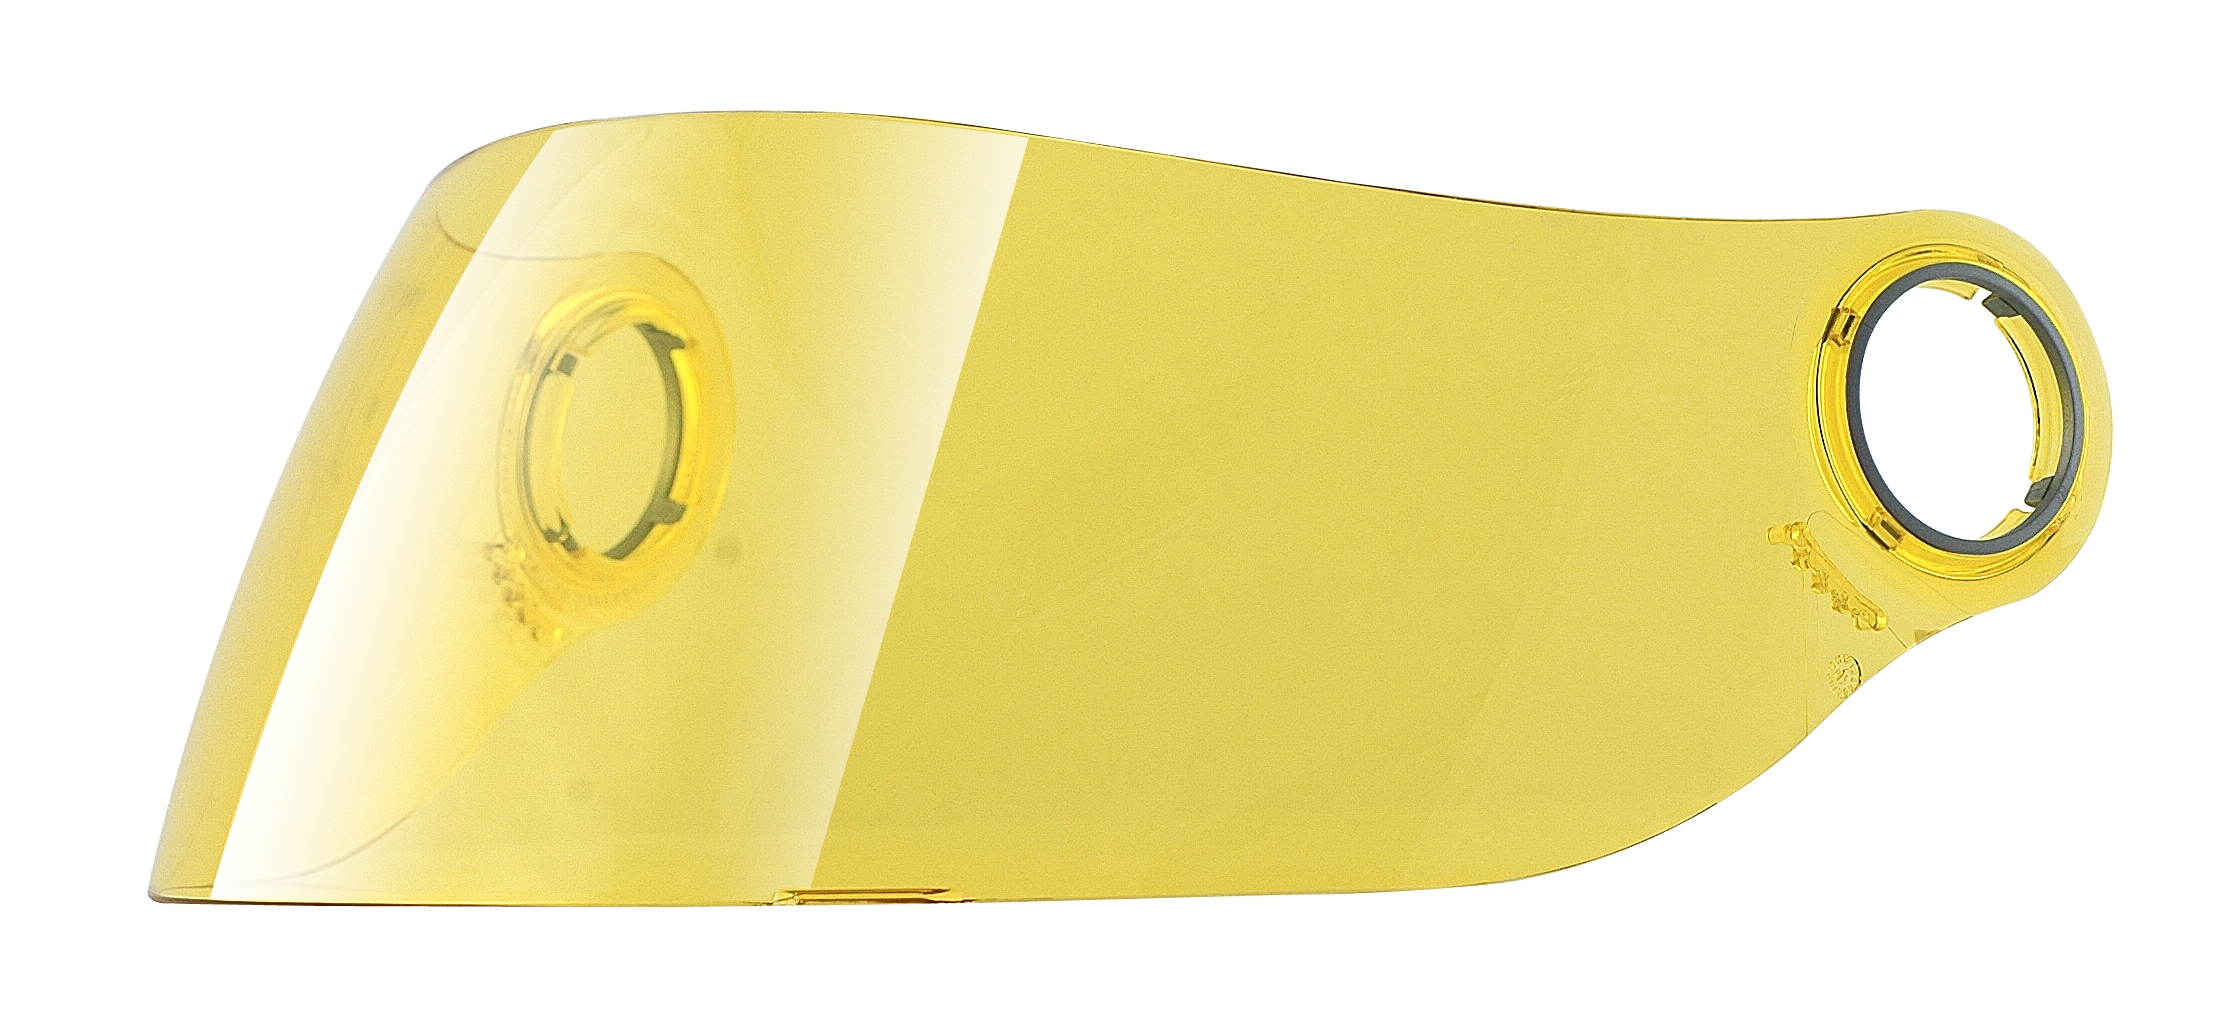 visier gelb get nt shark ridill s900 c s700 s s800. Black Bedroom Furniture Sets. Home Design Ideas